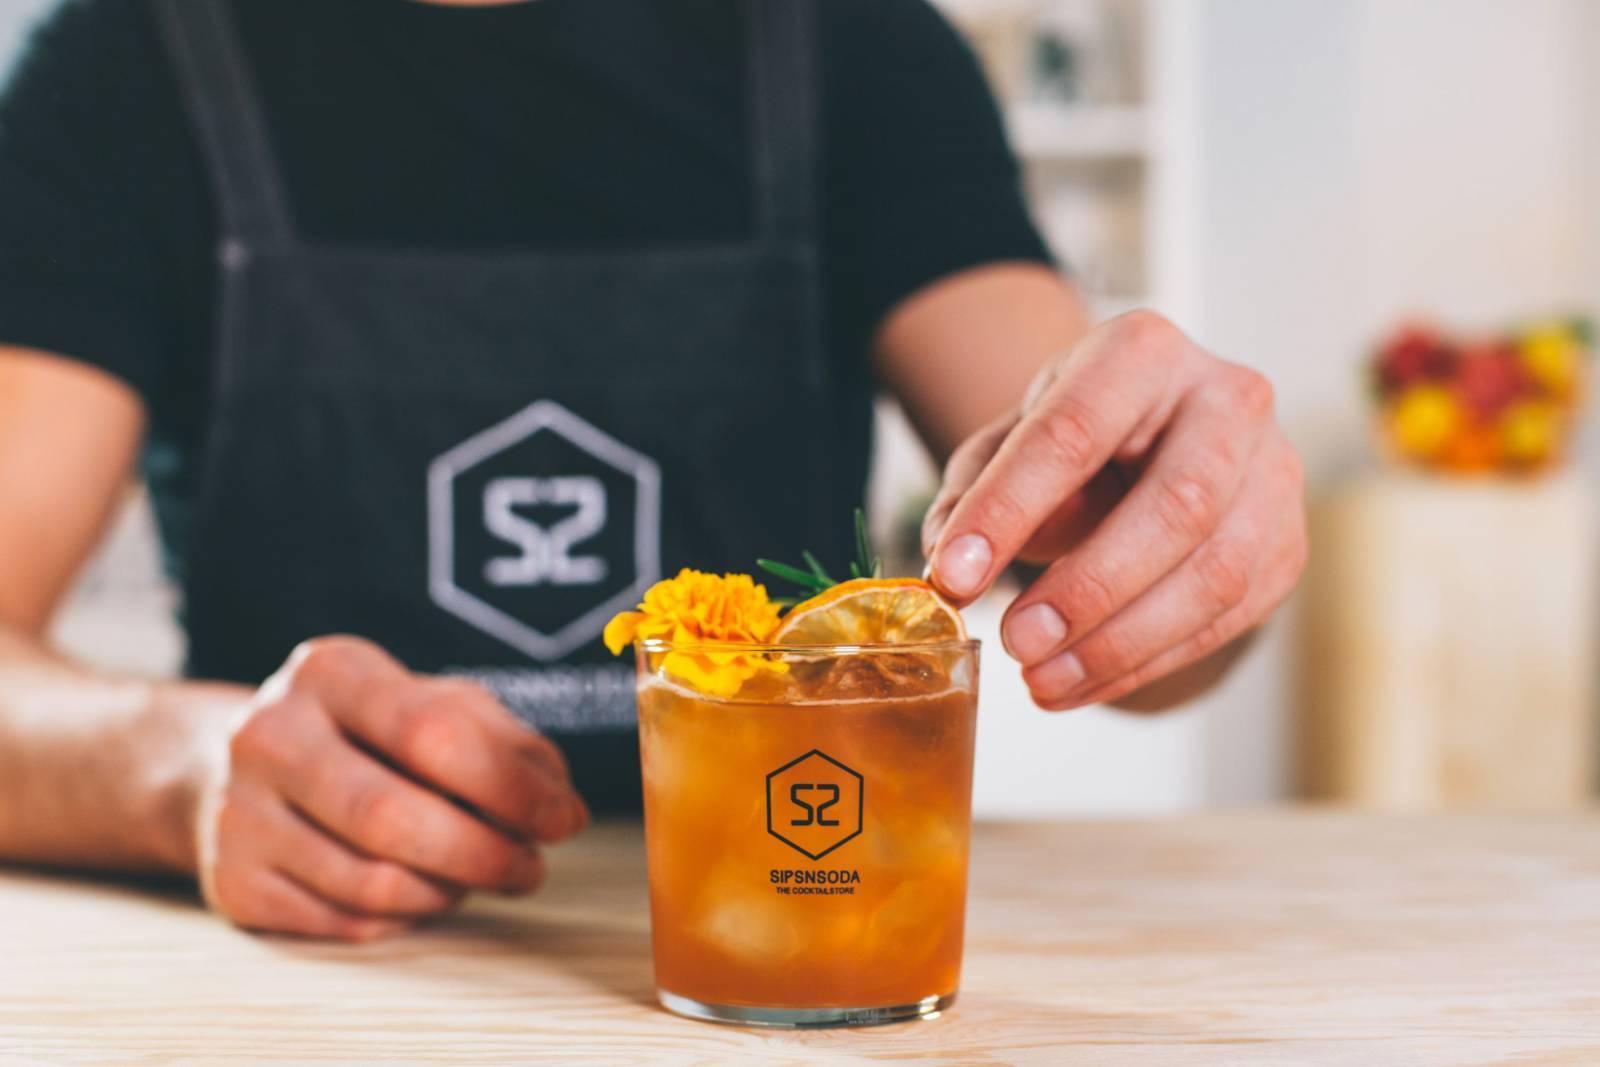 Sipsnsoda - Cocktails en mobiele bars - House of Weddings  - 12